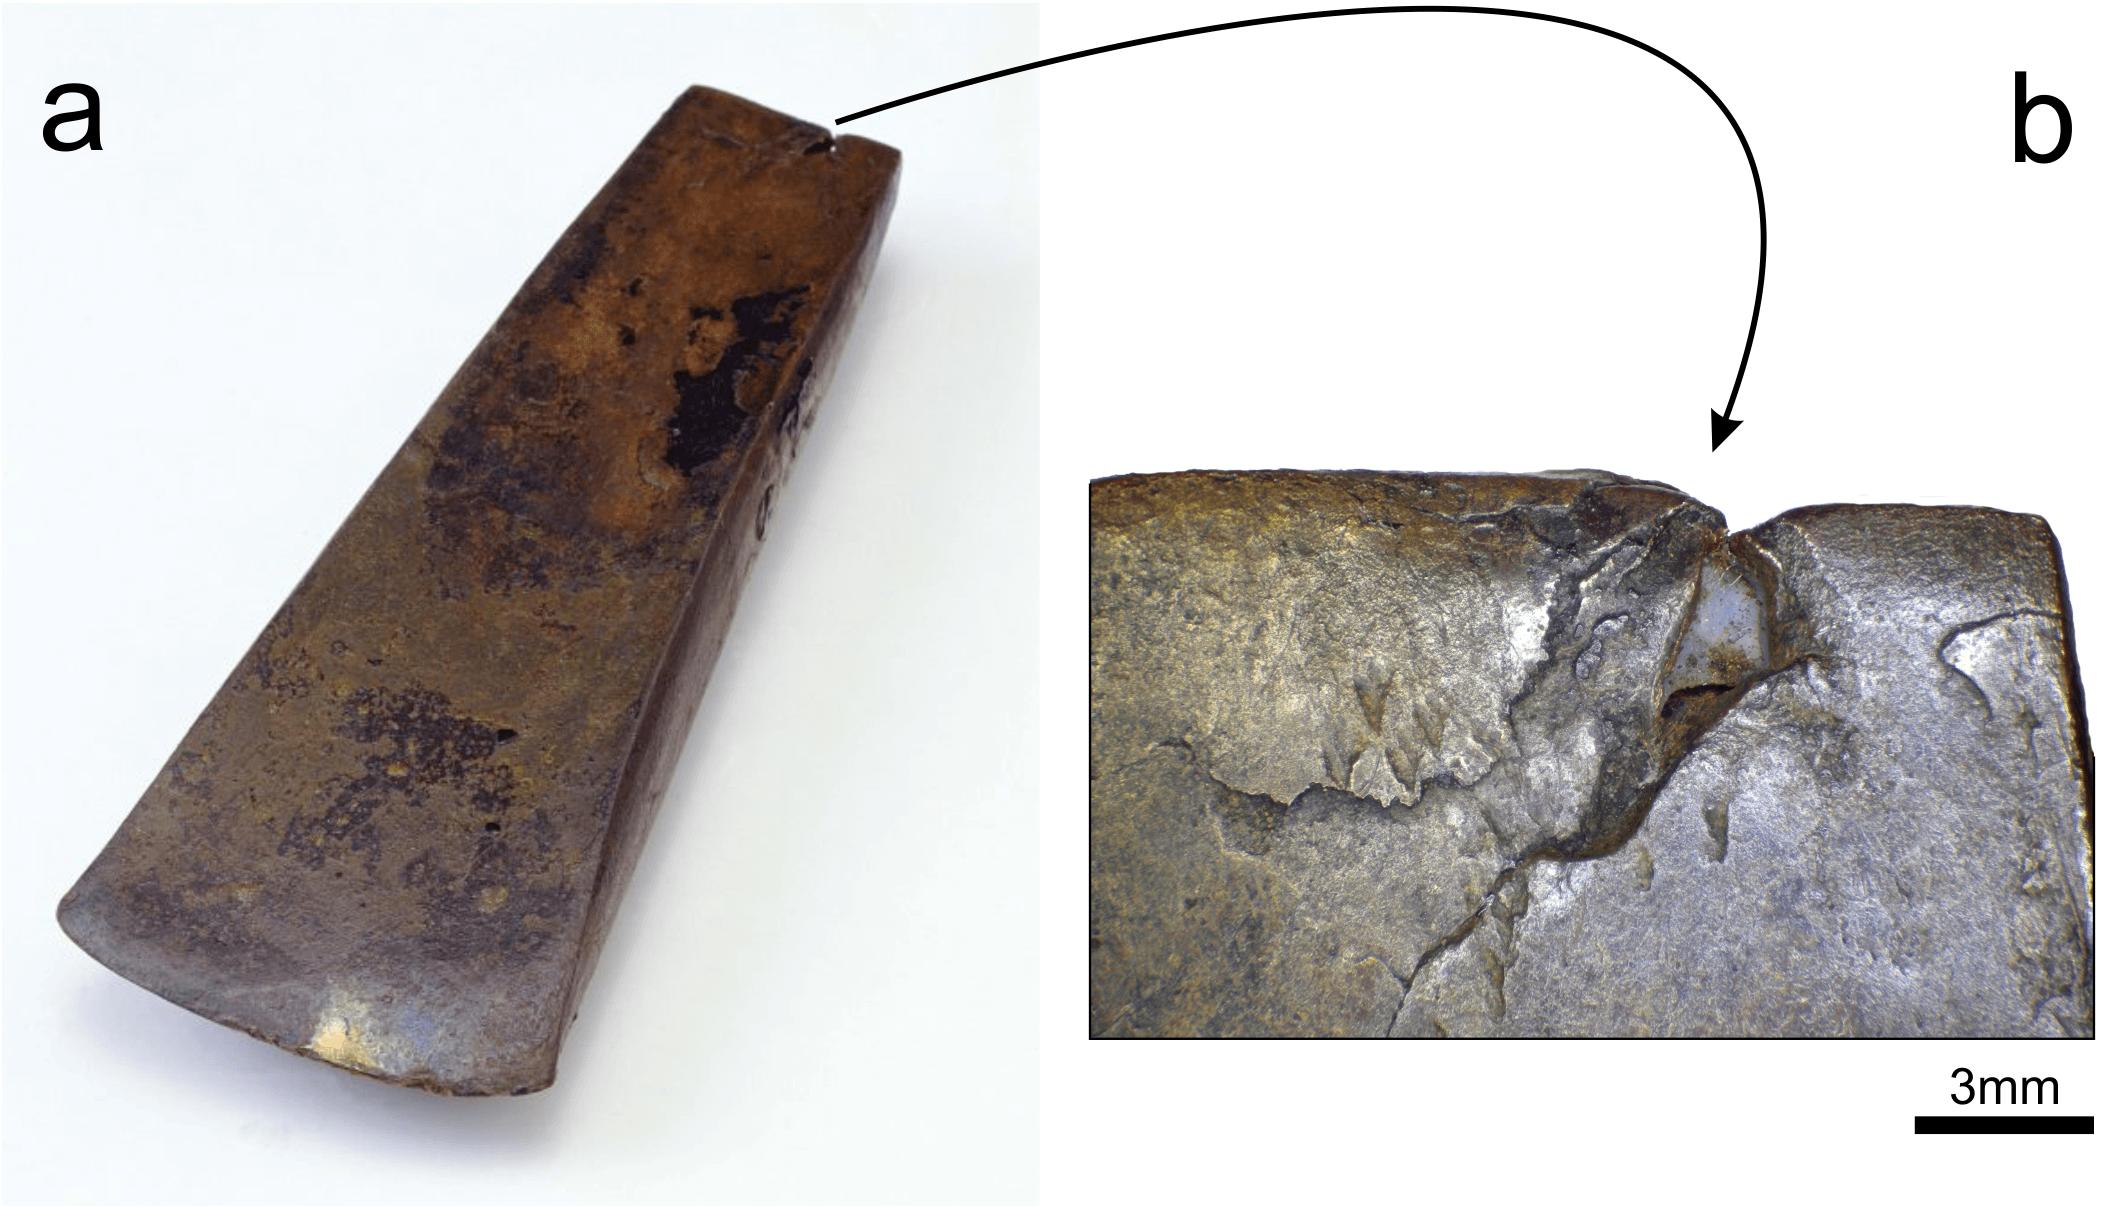 Segni di usura sull' ascia di Ötzi